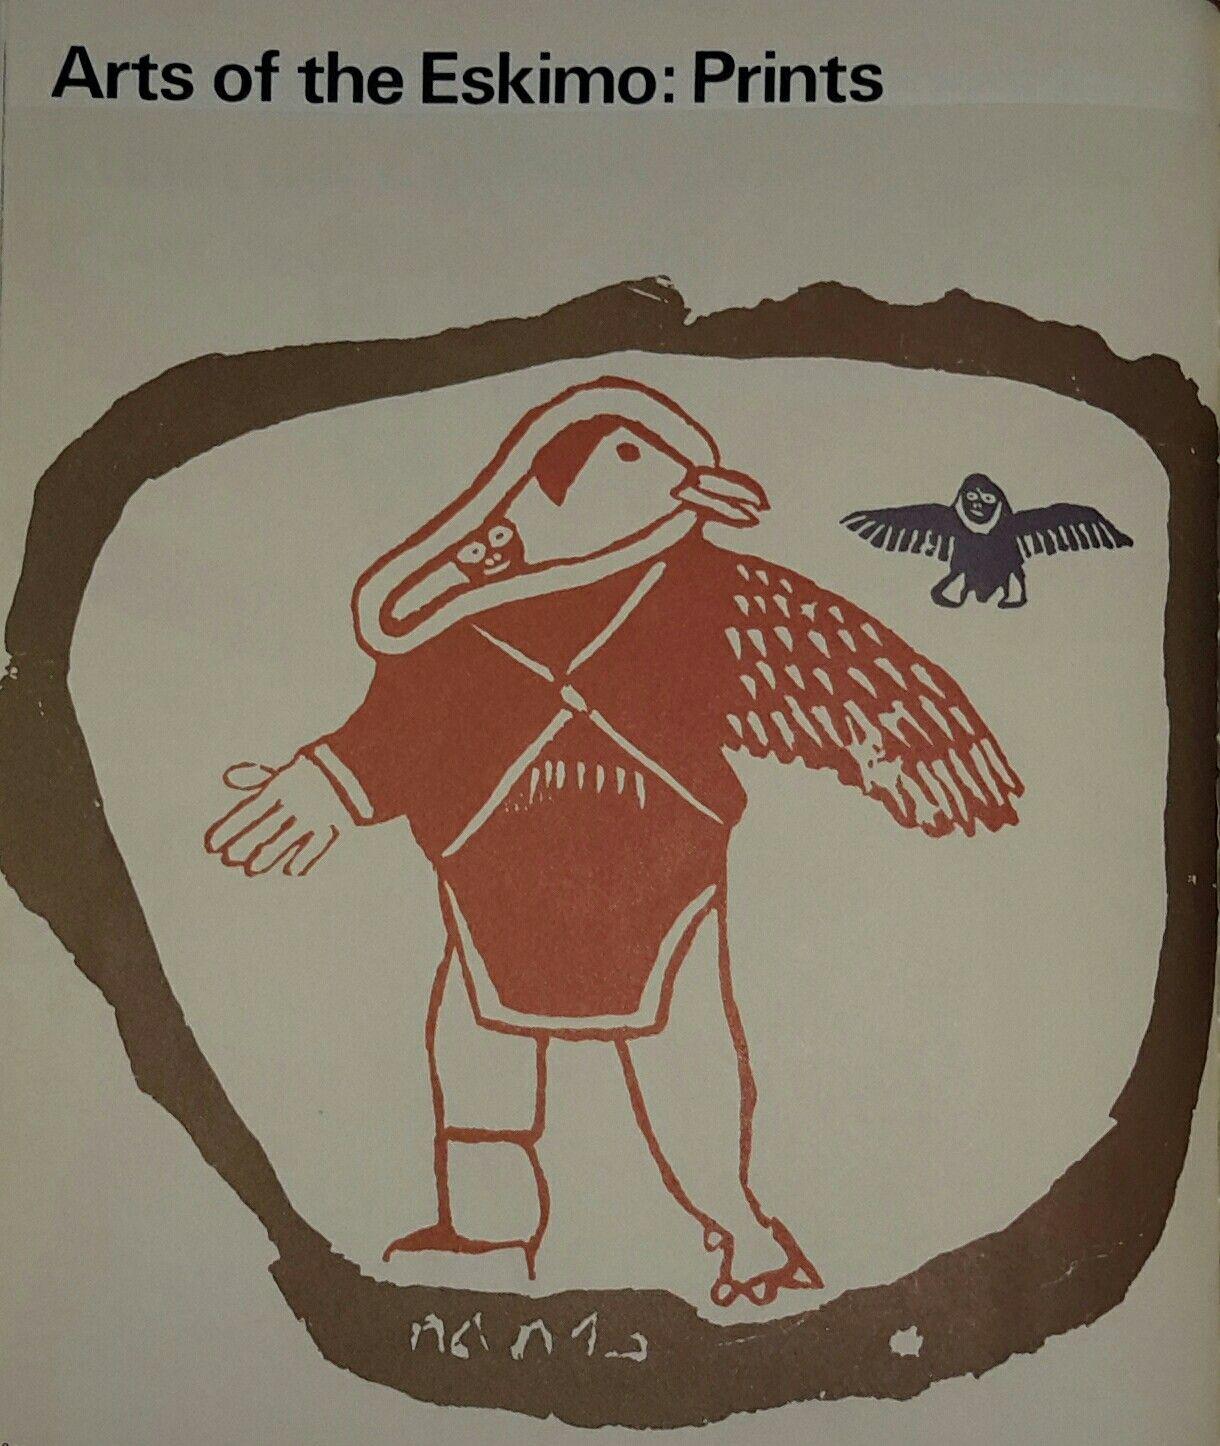 Art of Eskimo: Insert Prints